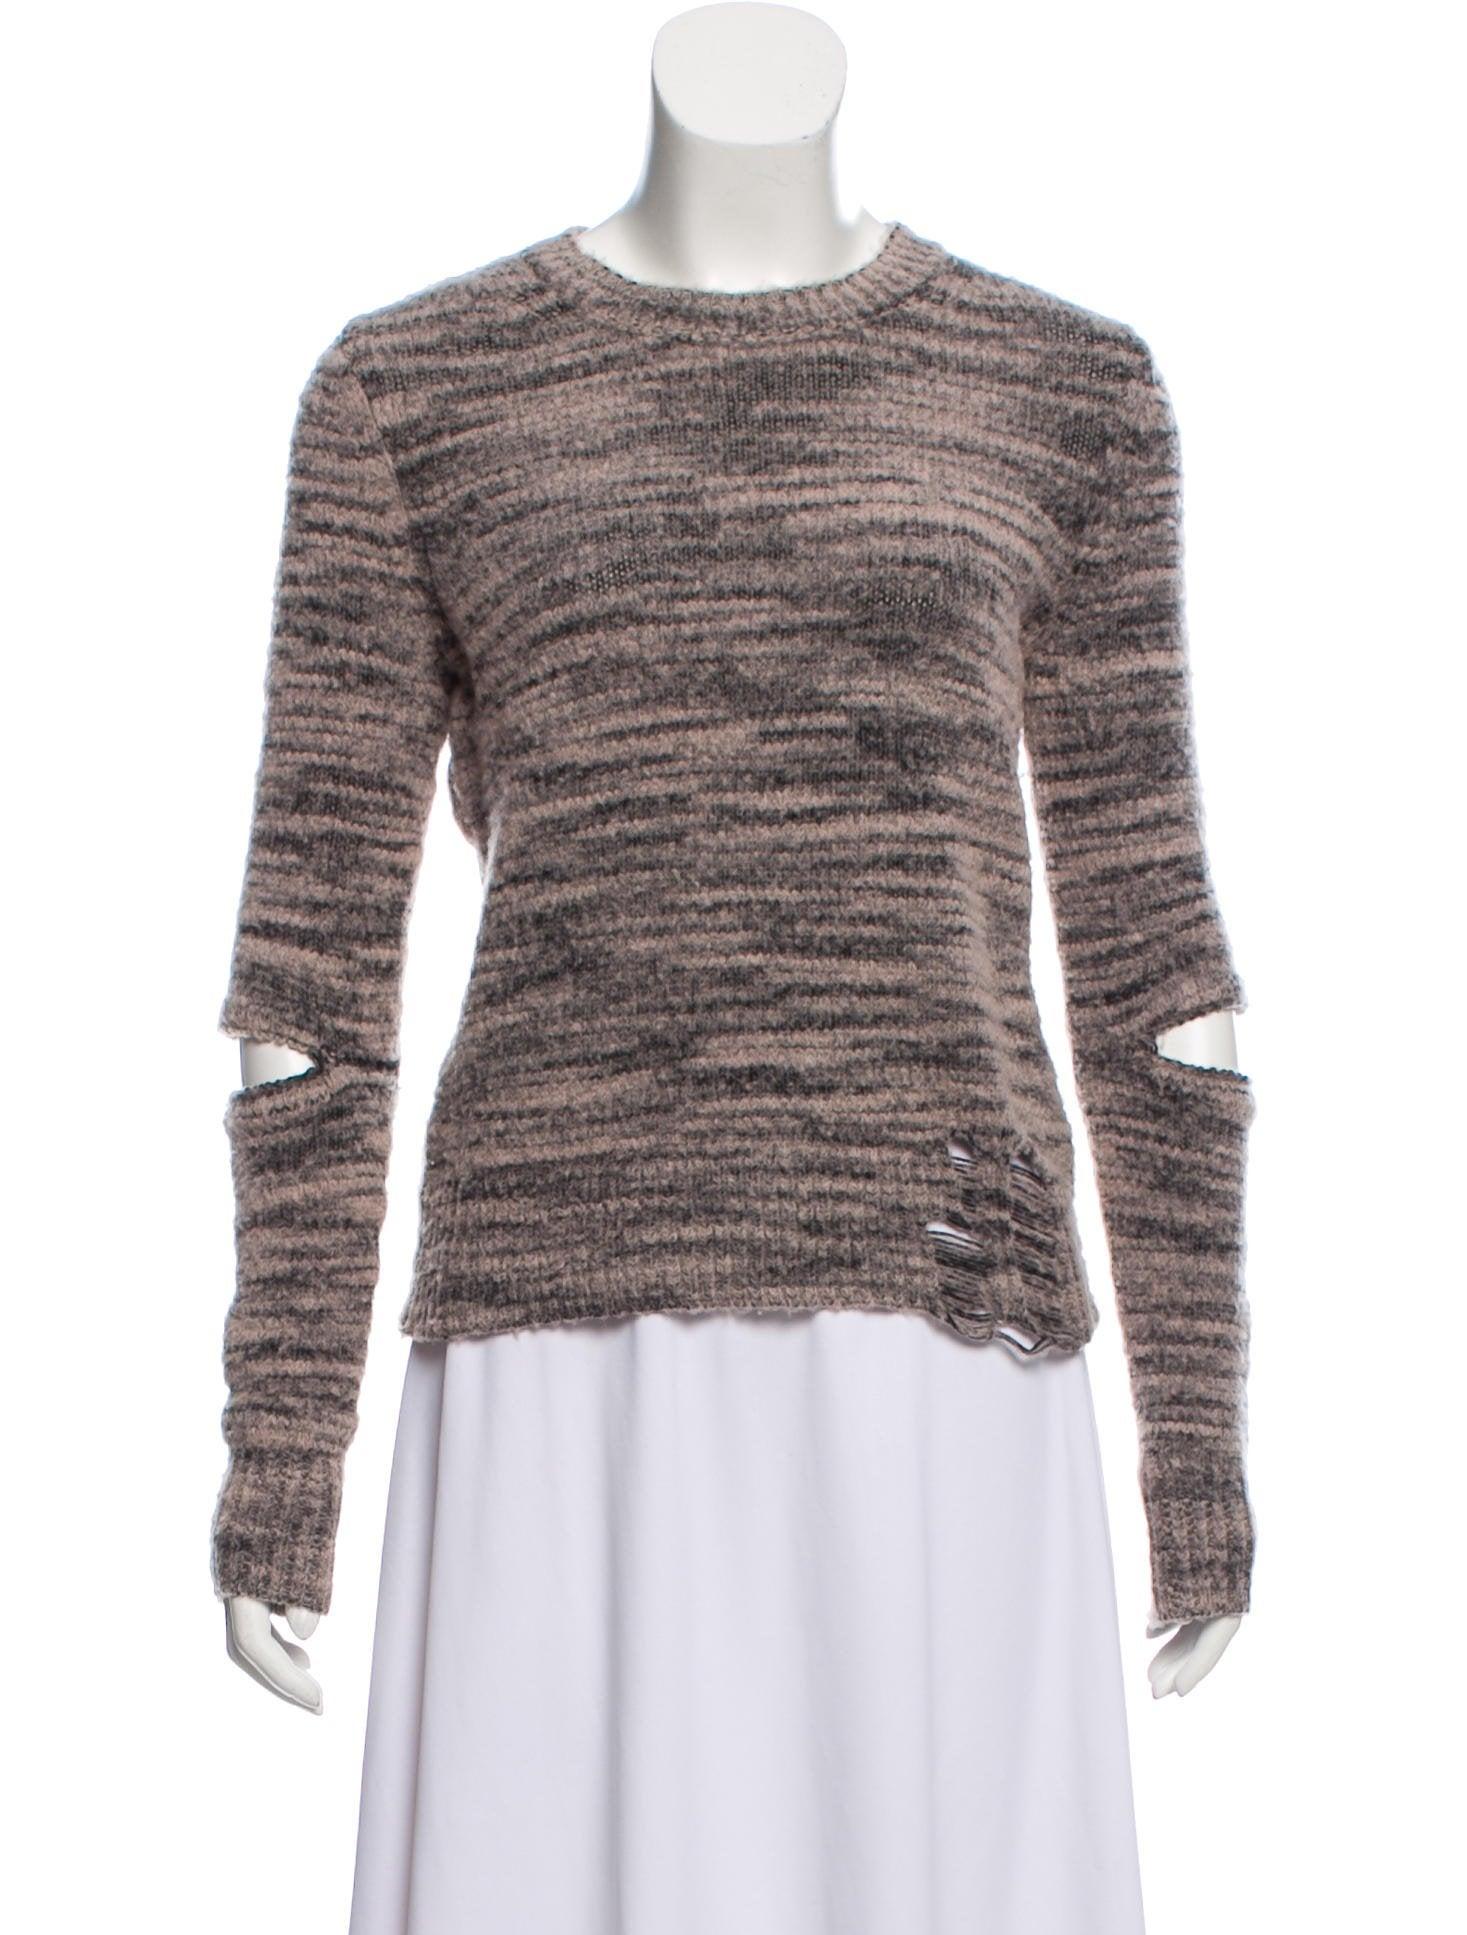 c07b0b39d25 Raquel Allegra Distressed Knit Sweater - Clothing - WRQLL32971